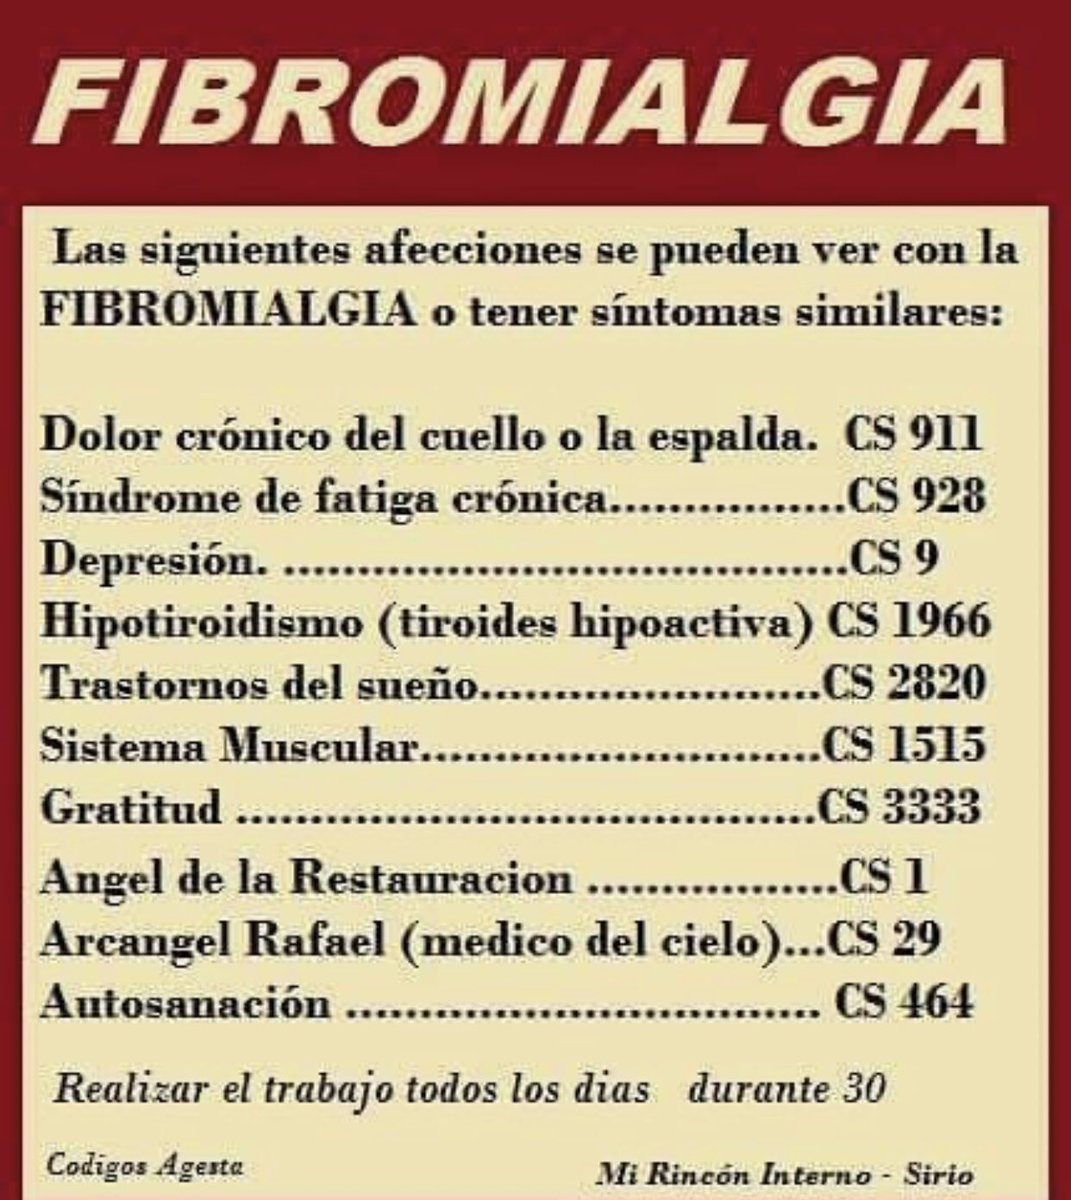 CODIGOS SAGRADOS https://t.co/yfP5RjYTtr